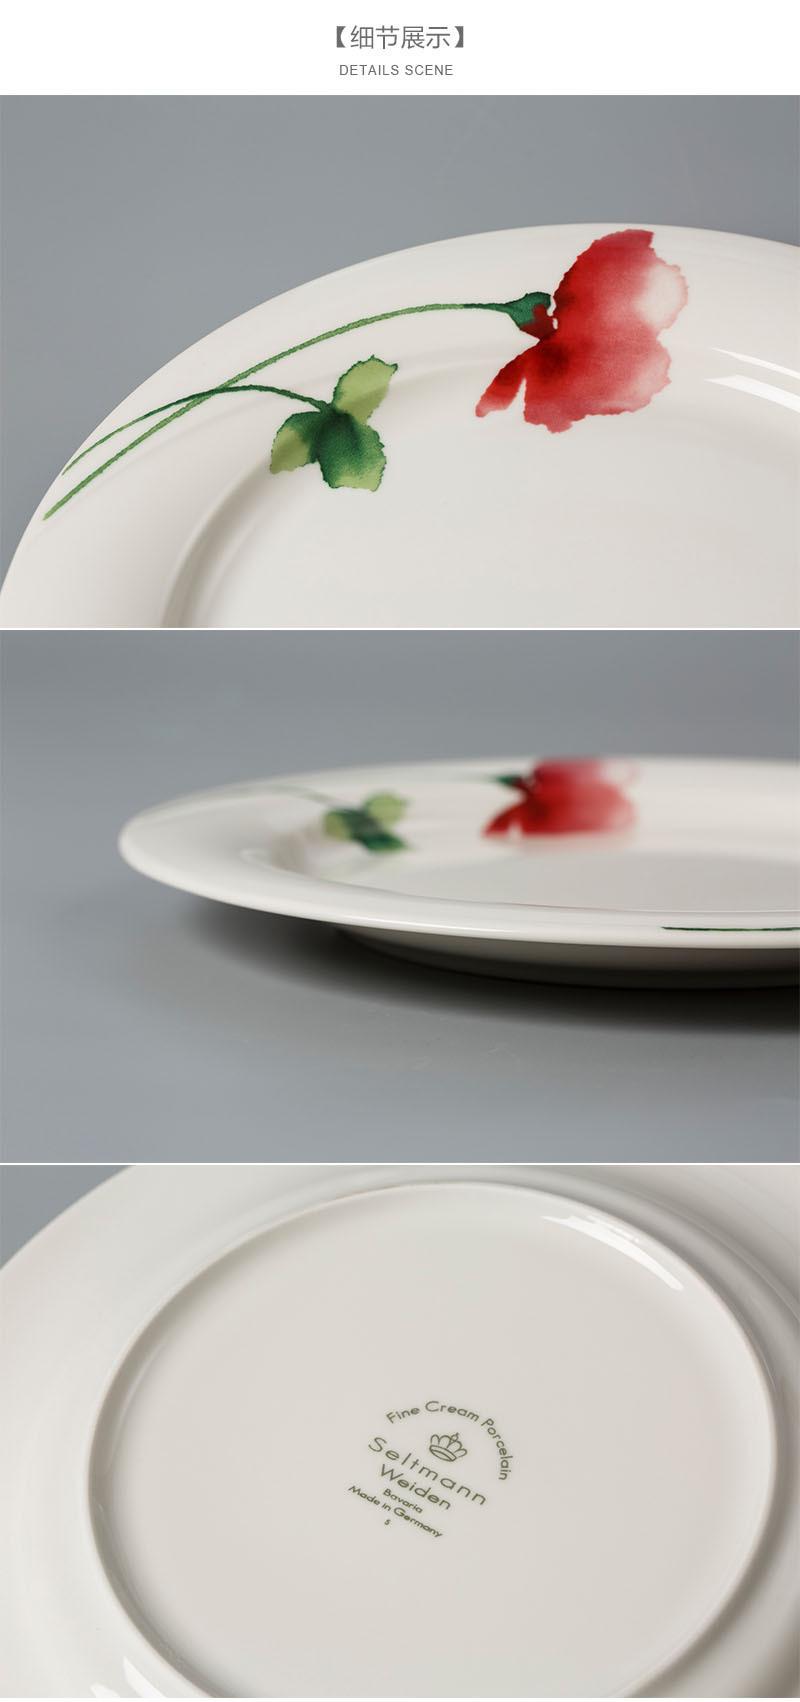 Seltmann Weiden绿叶红花汤盘细节展示